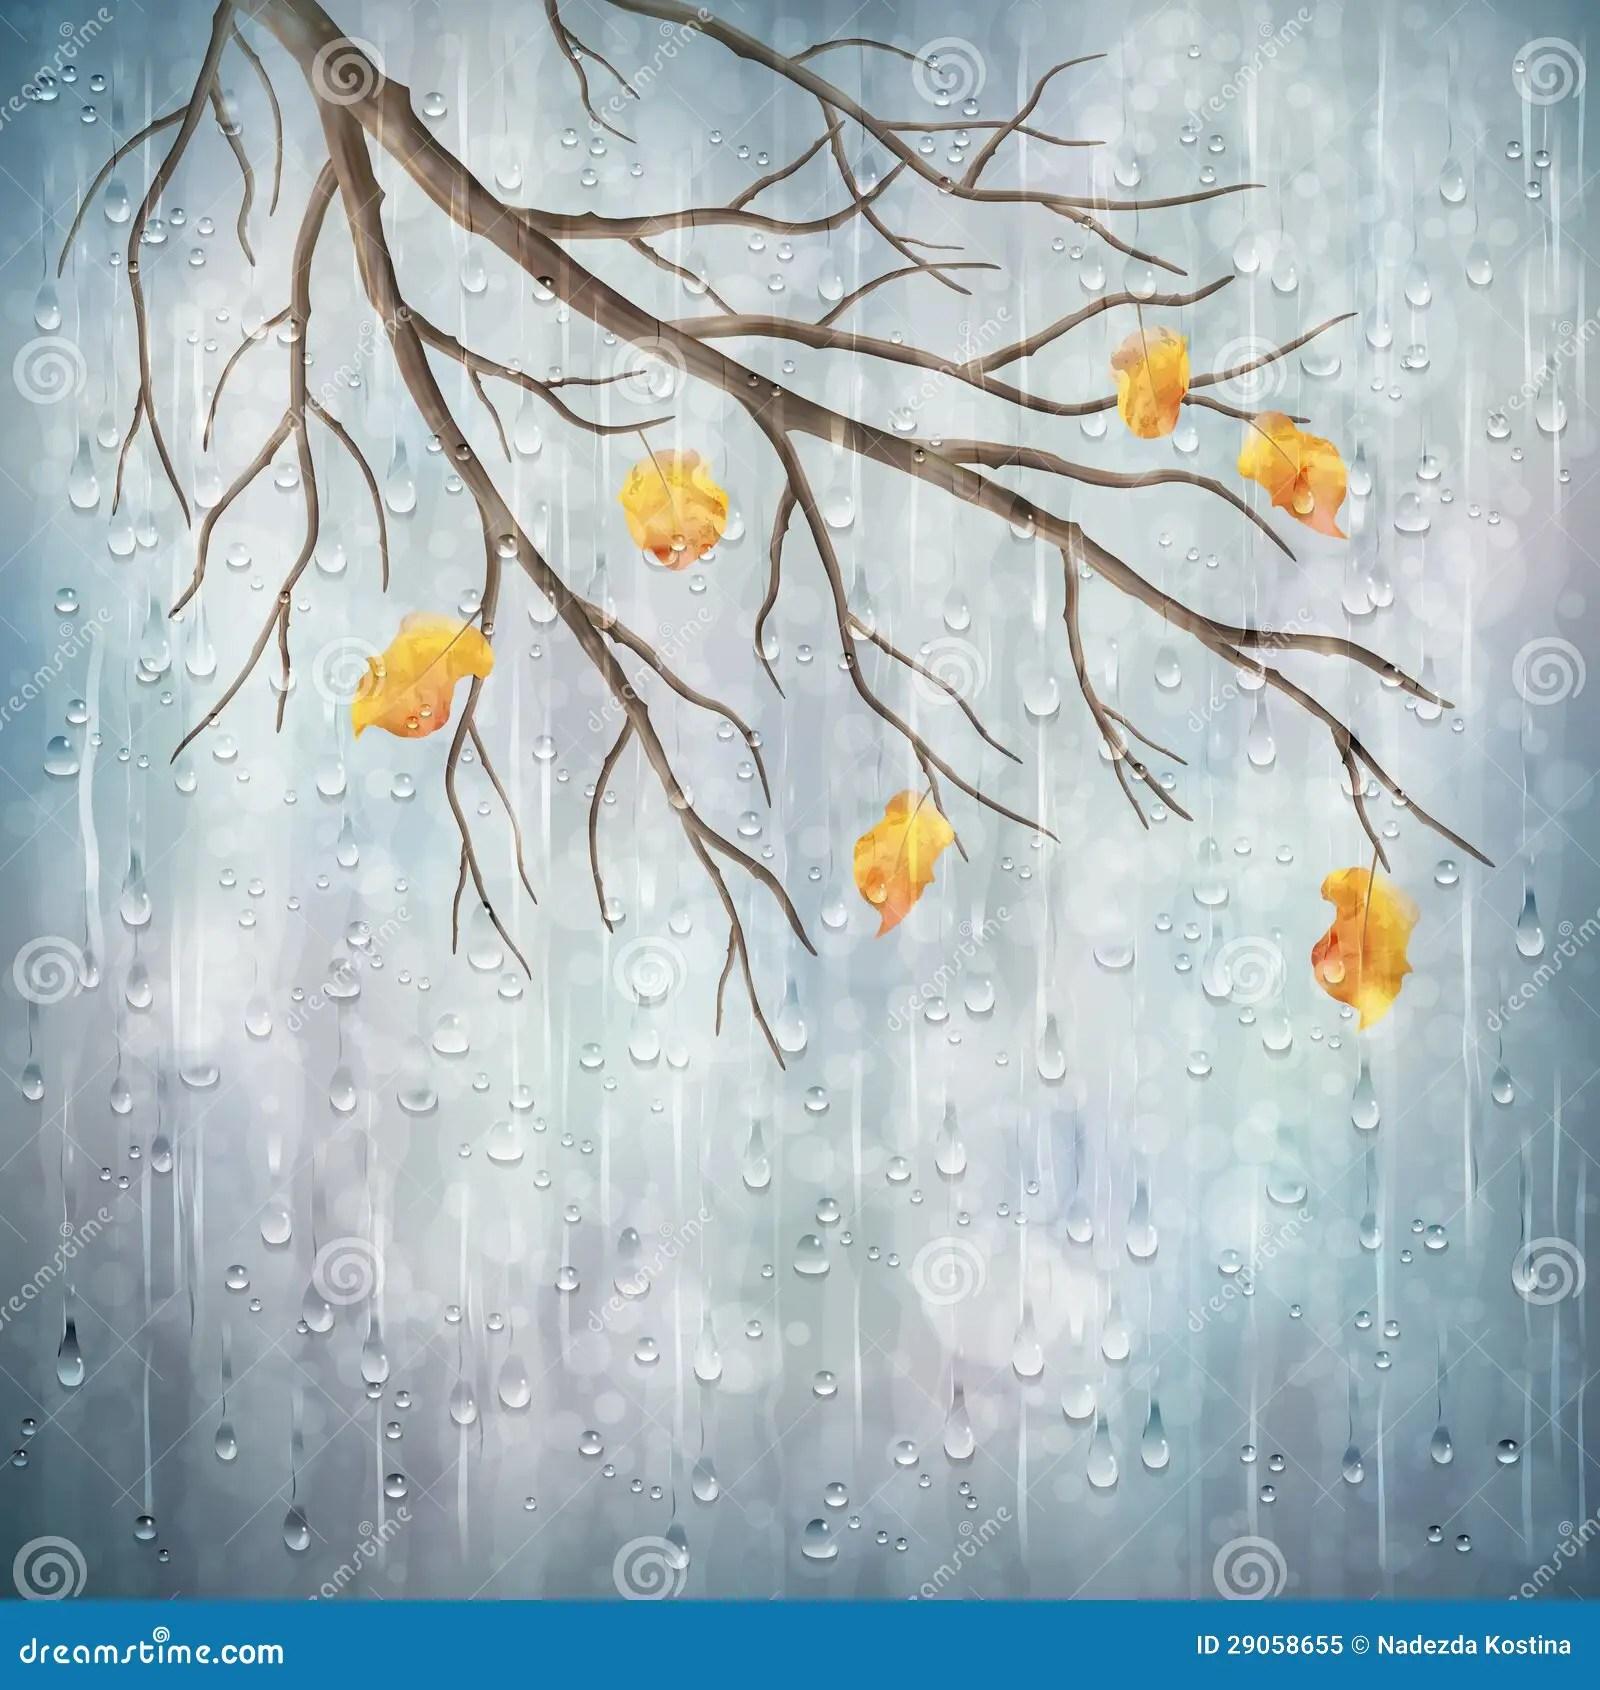 Free Wallpaper Fall Flowers Vector Autumn Rain Weather Artistic Natural Design Royalty